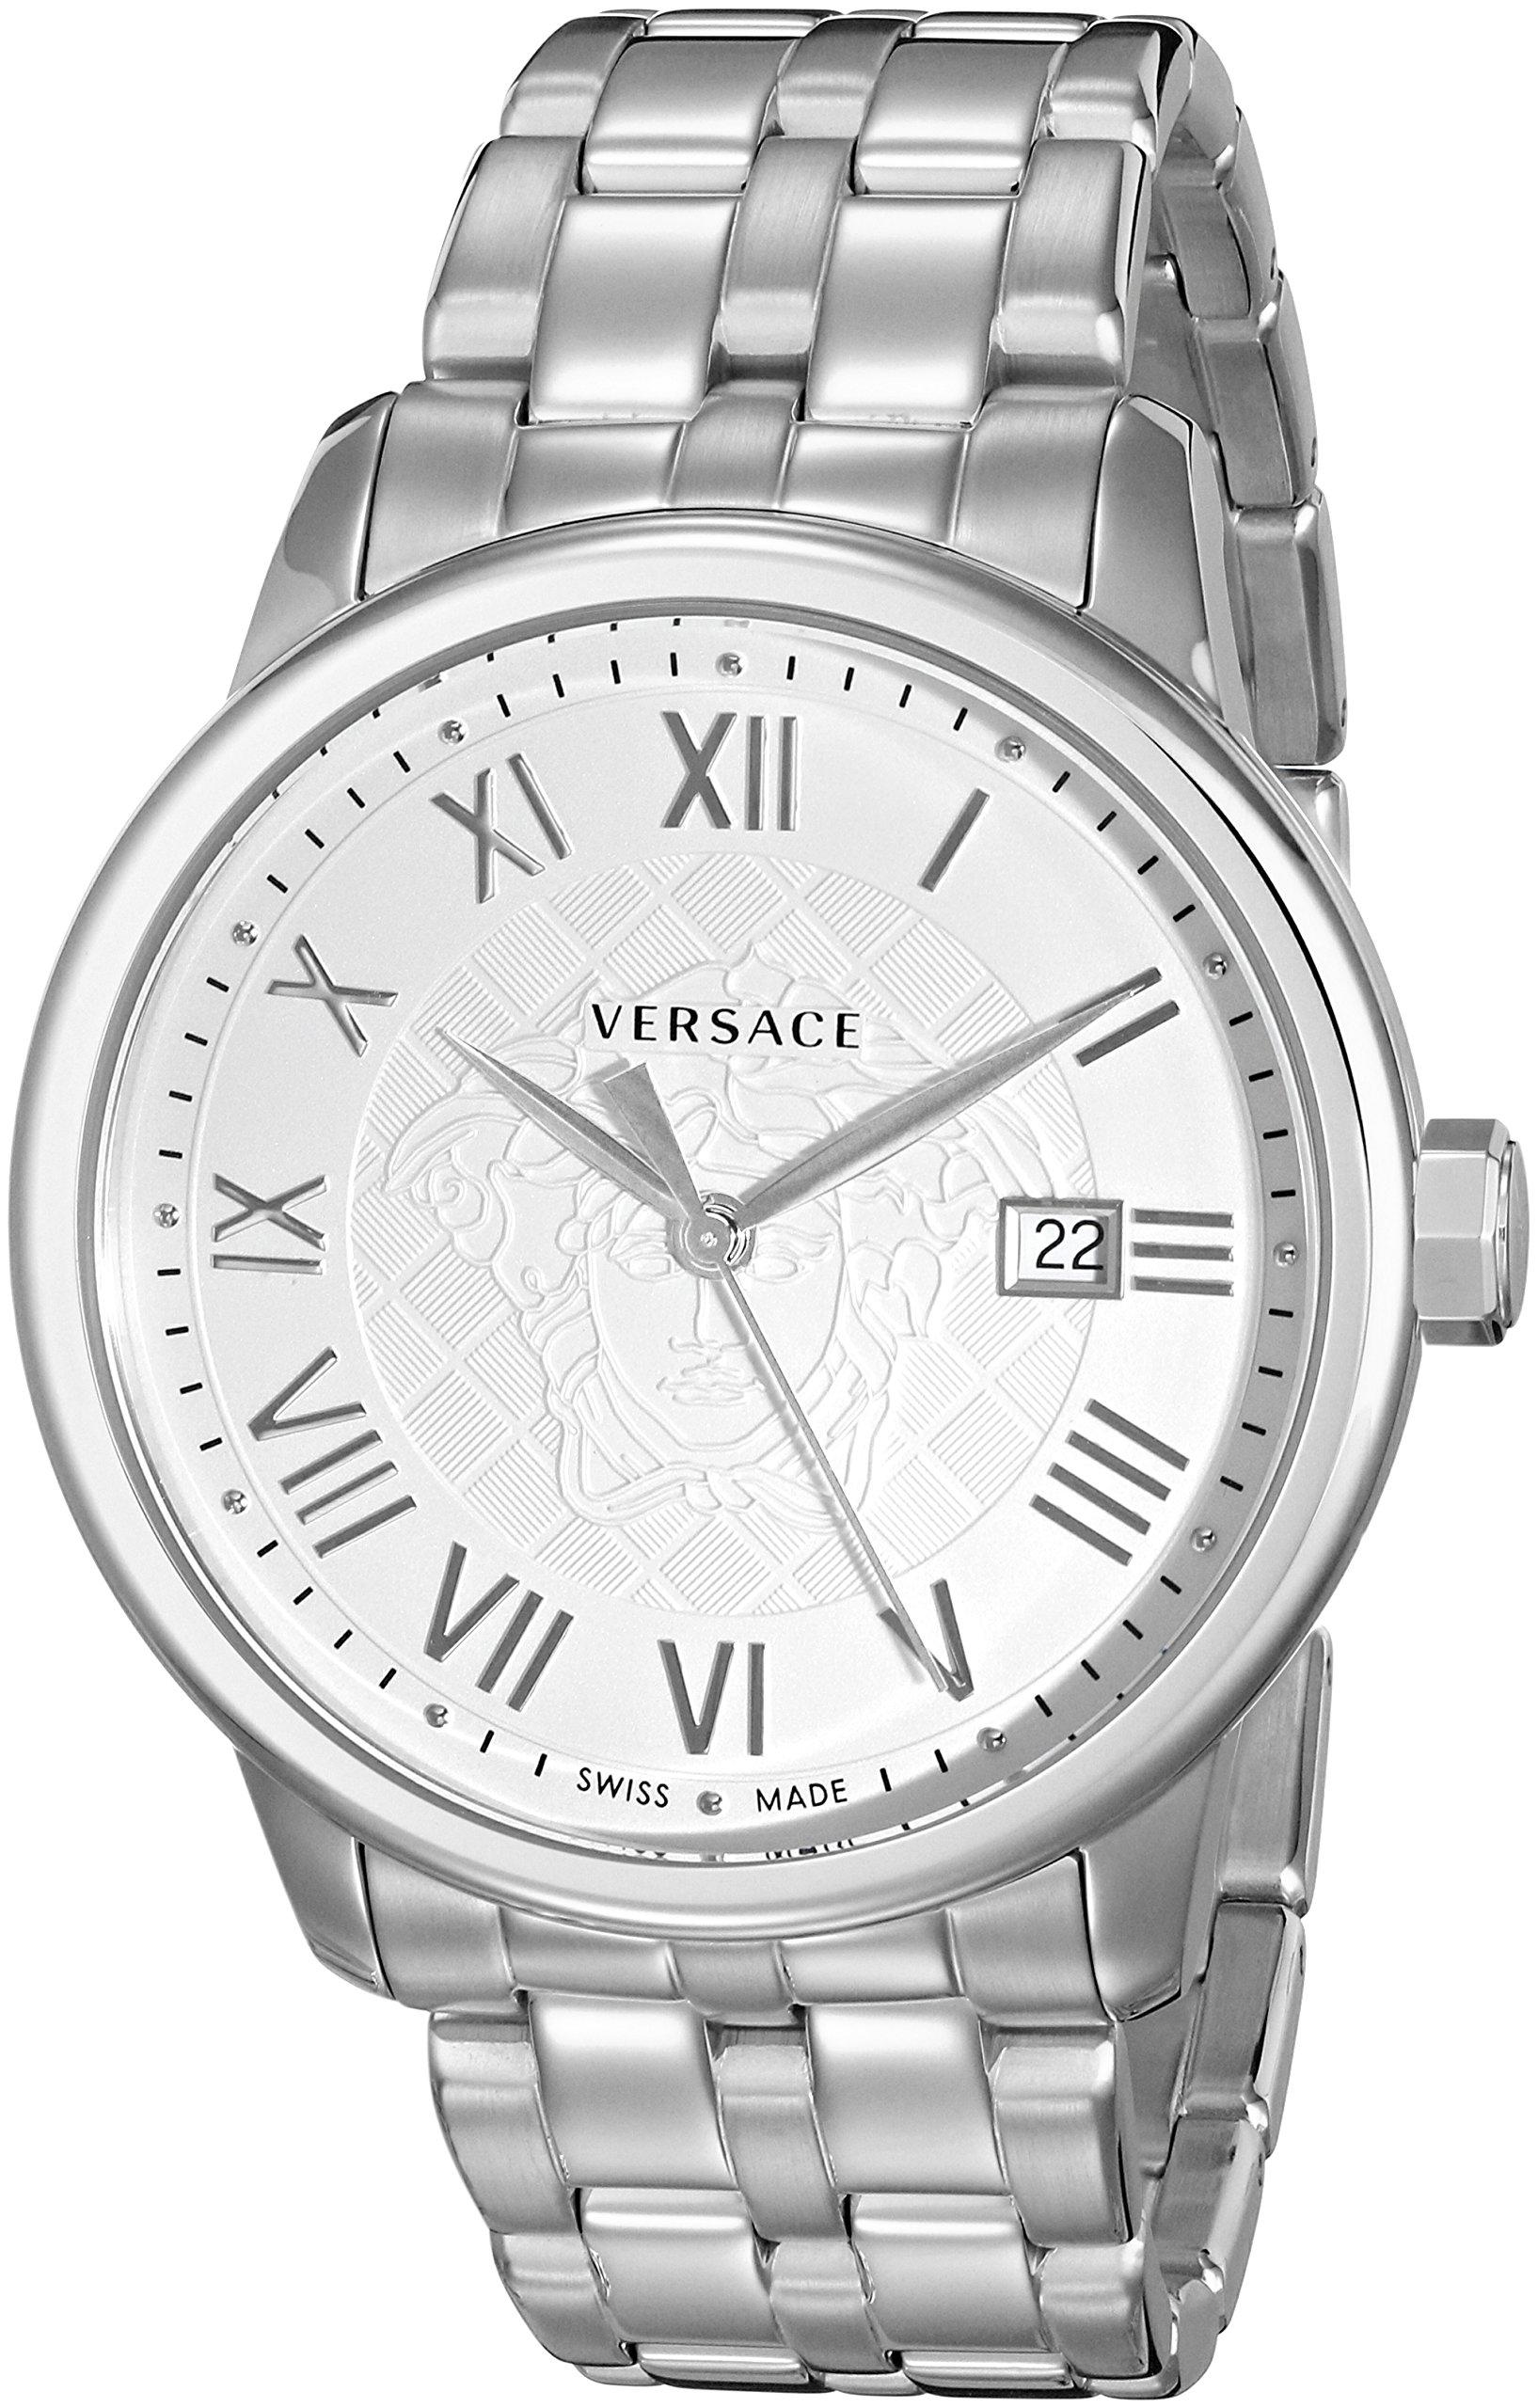 Versace Men's VQS040015 Business Analog Display Quartz Silver Watch by Versace